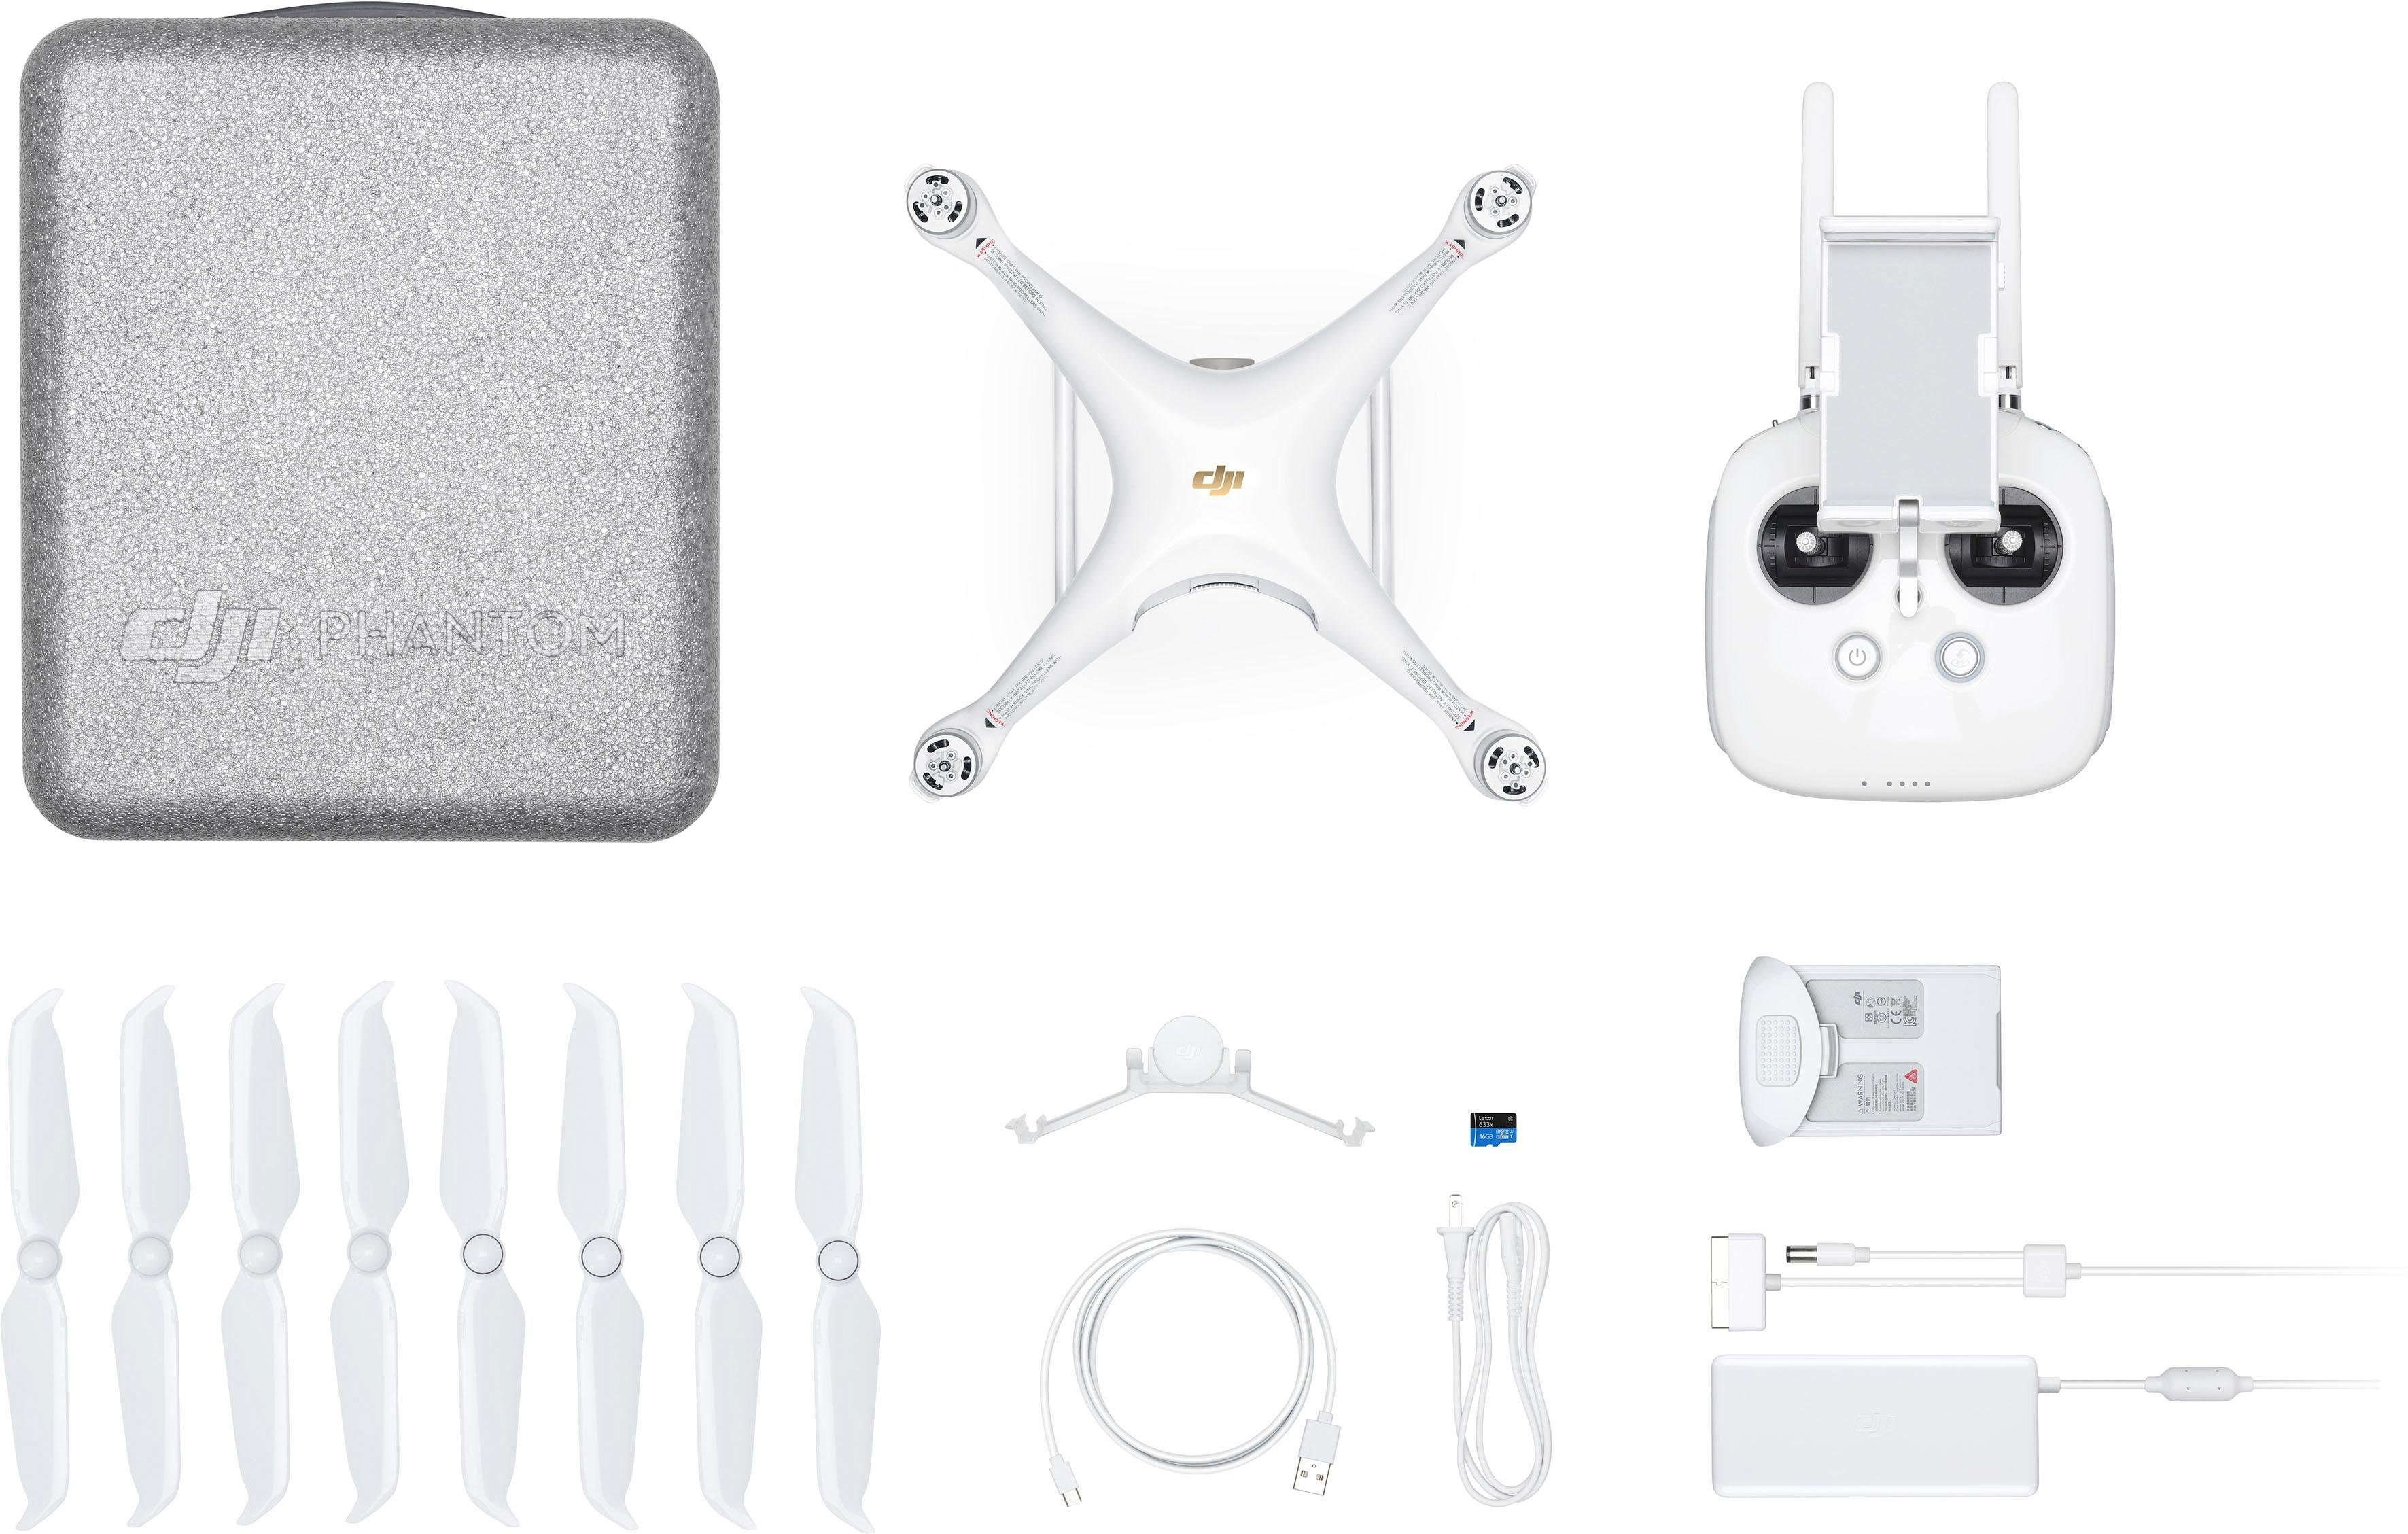 dji Drohne »Phantom 4 Pro V2.0«